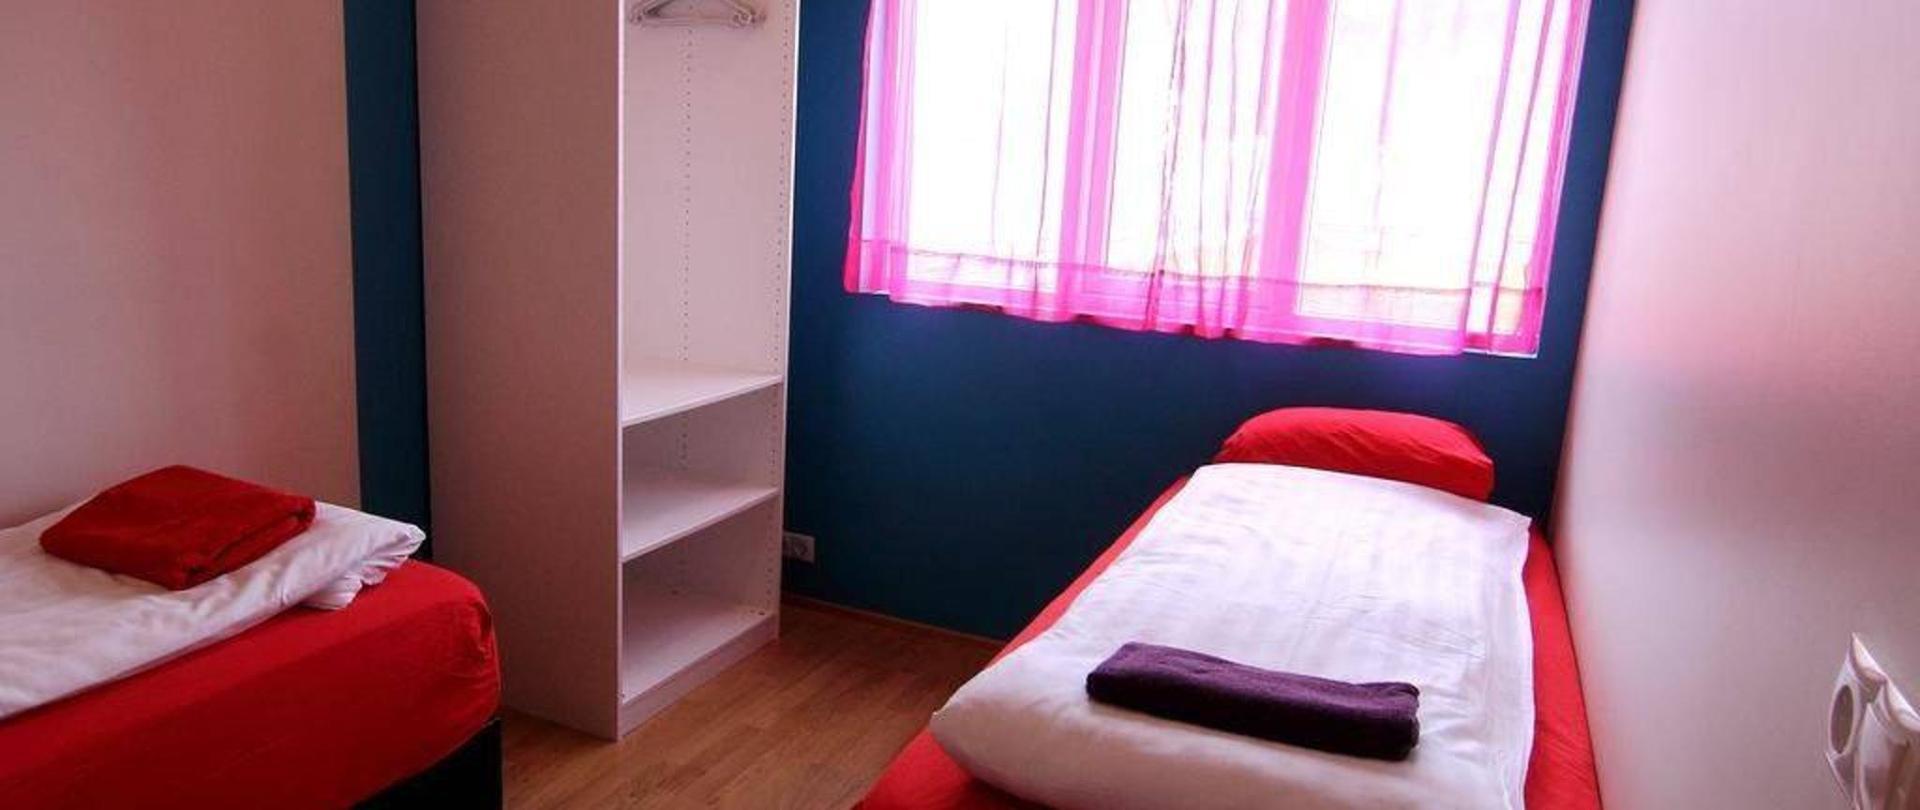 grundarfjordur-guesthouse-and-apartments-homepage-3.jpg